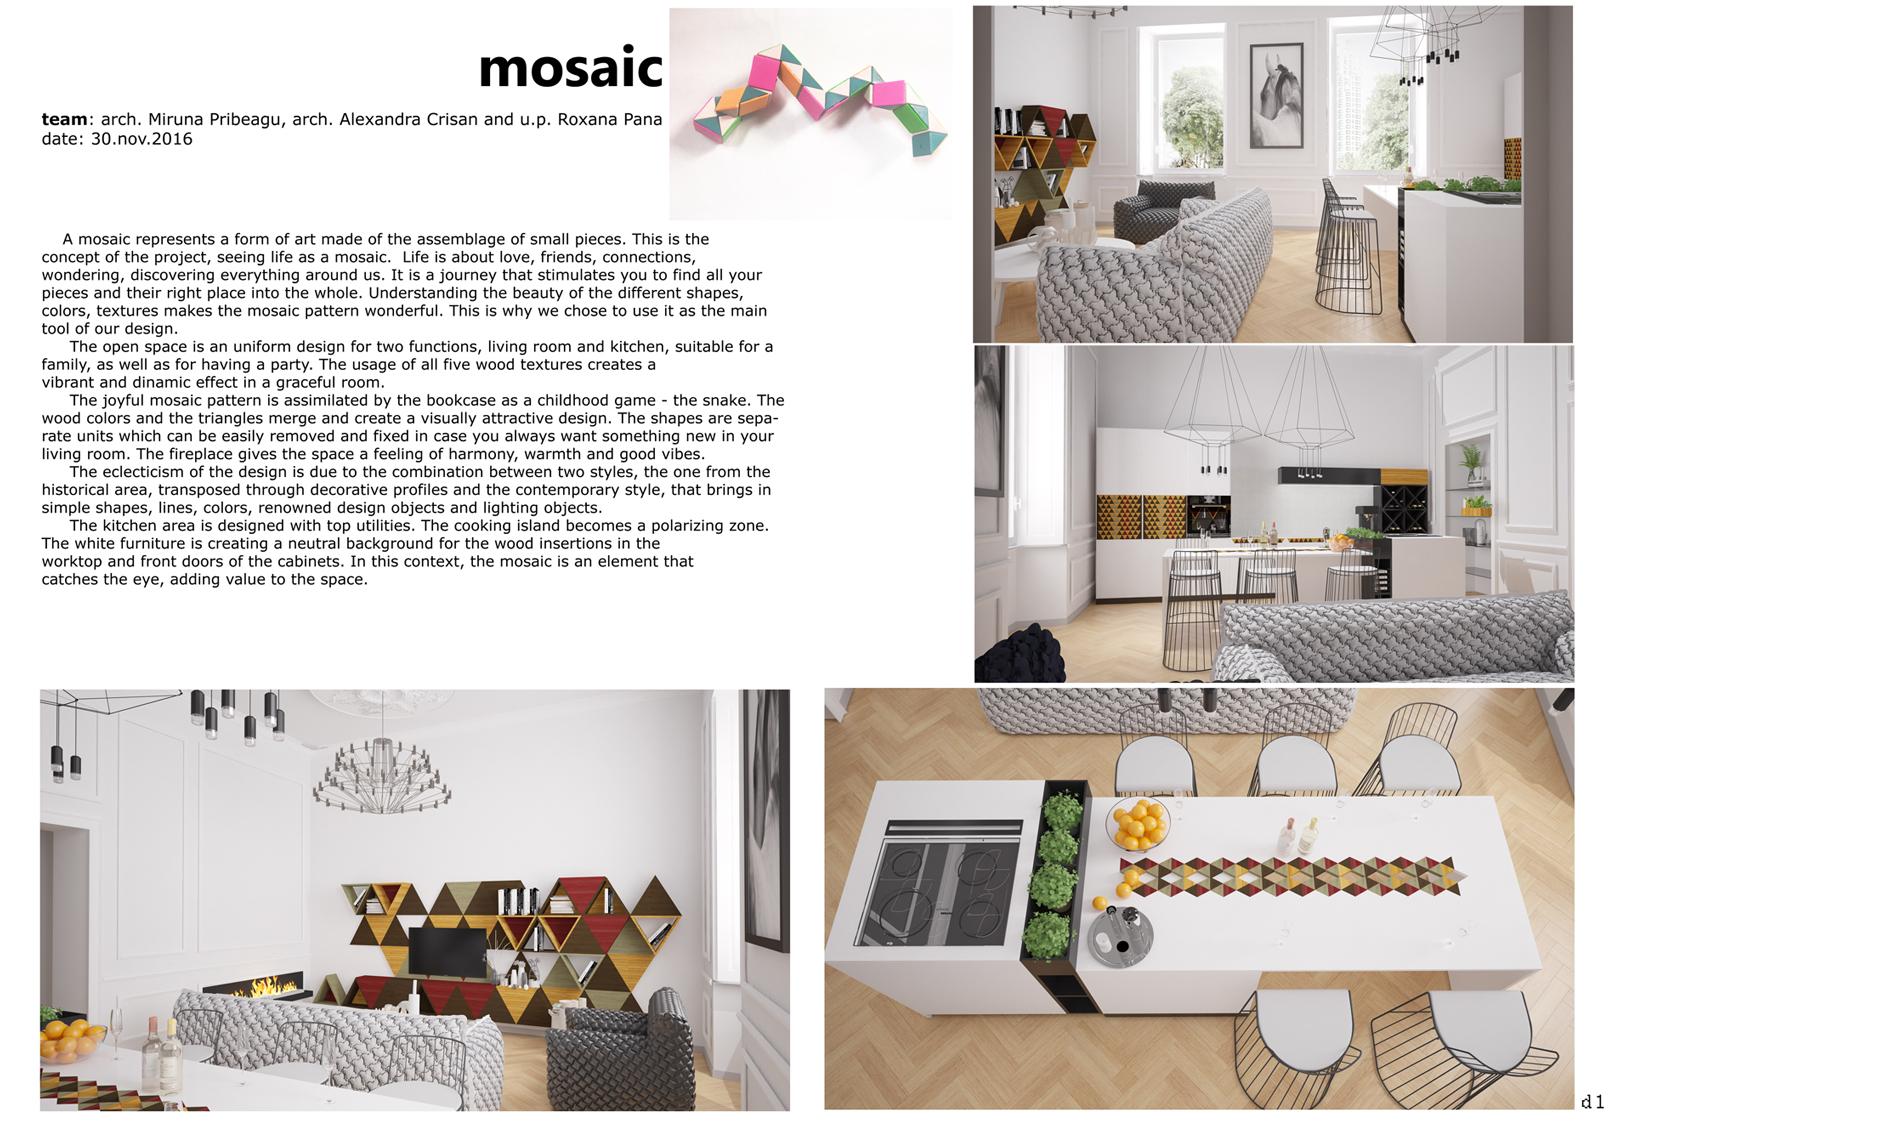 7study-interior-design-slow-wood-designboom-a